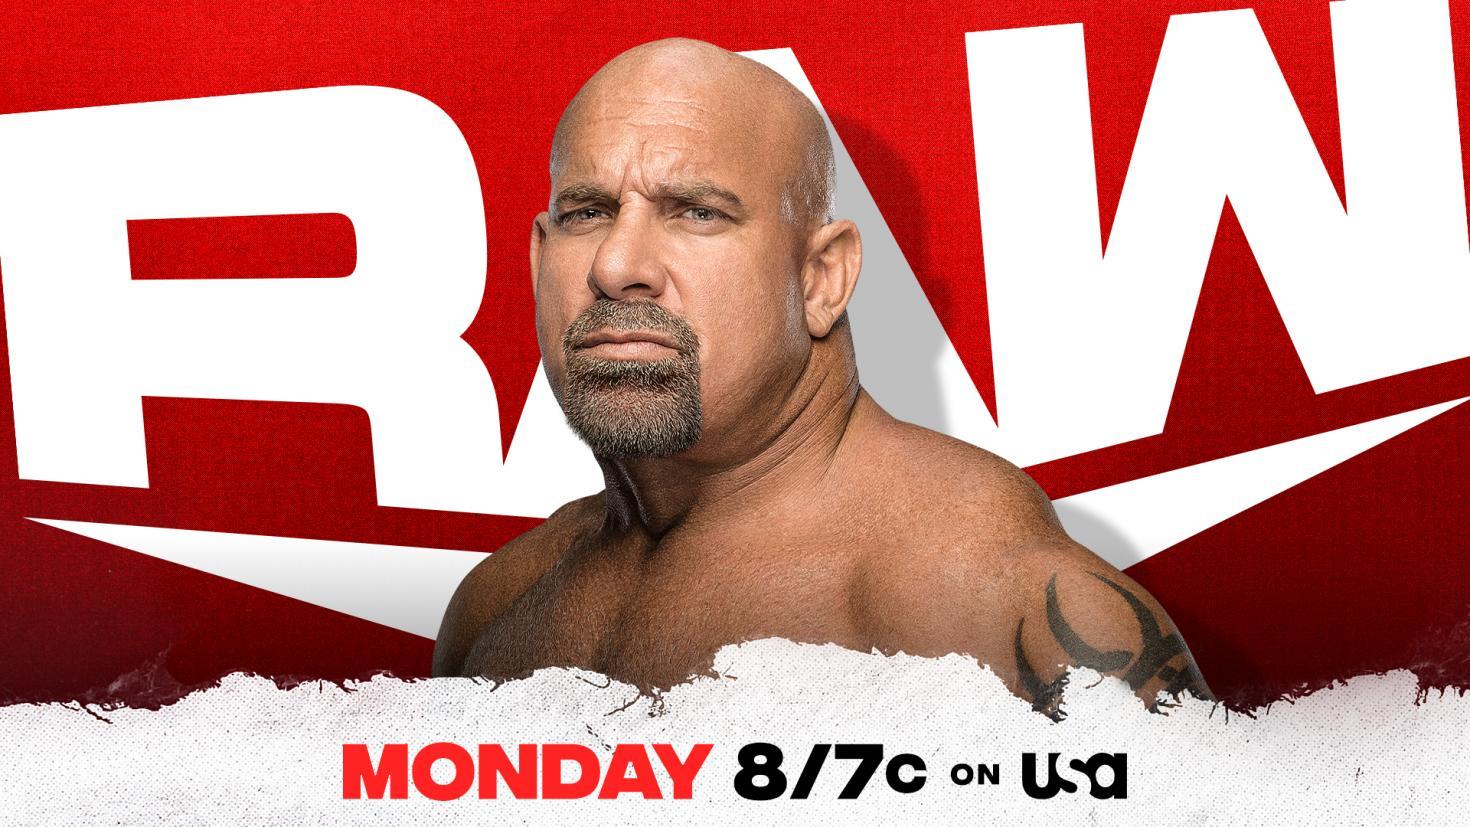 RAW: WWE proclaims Goldberg's presence